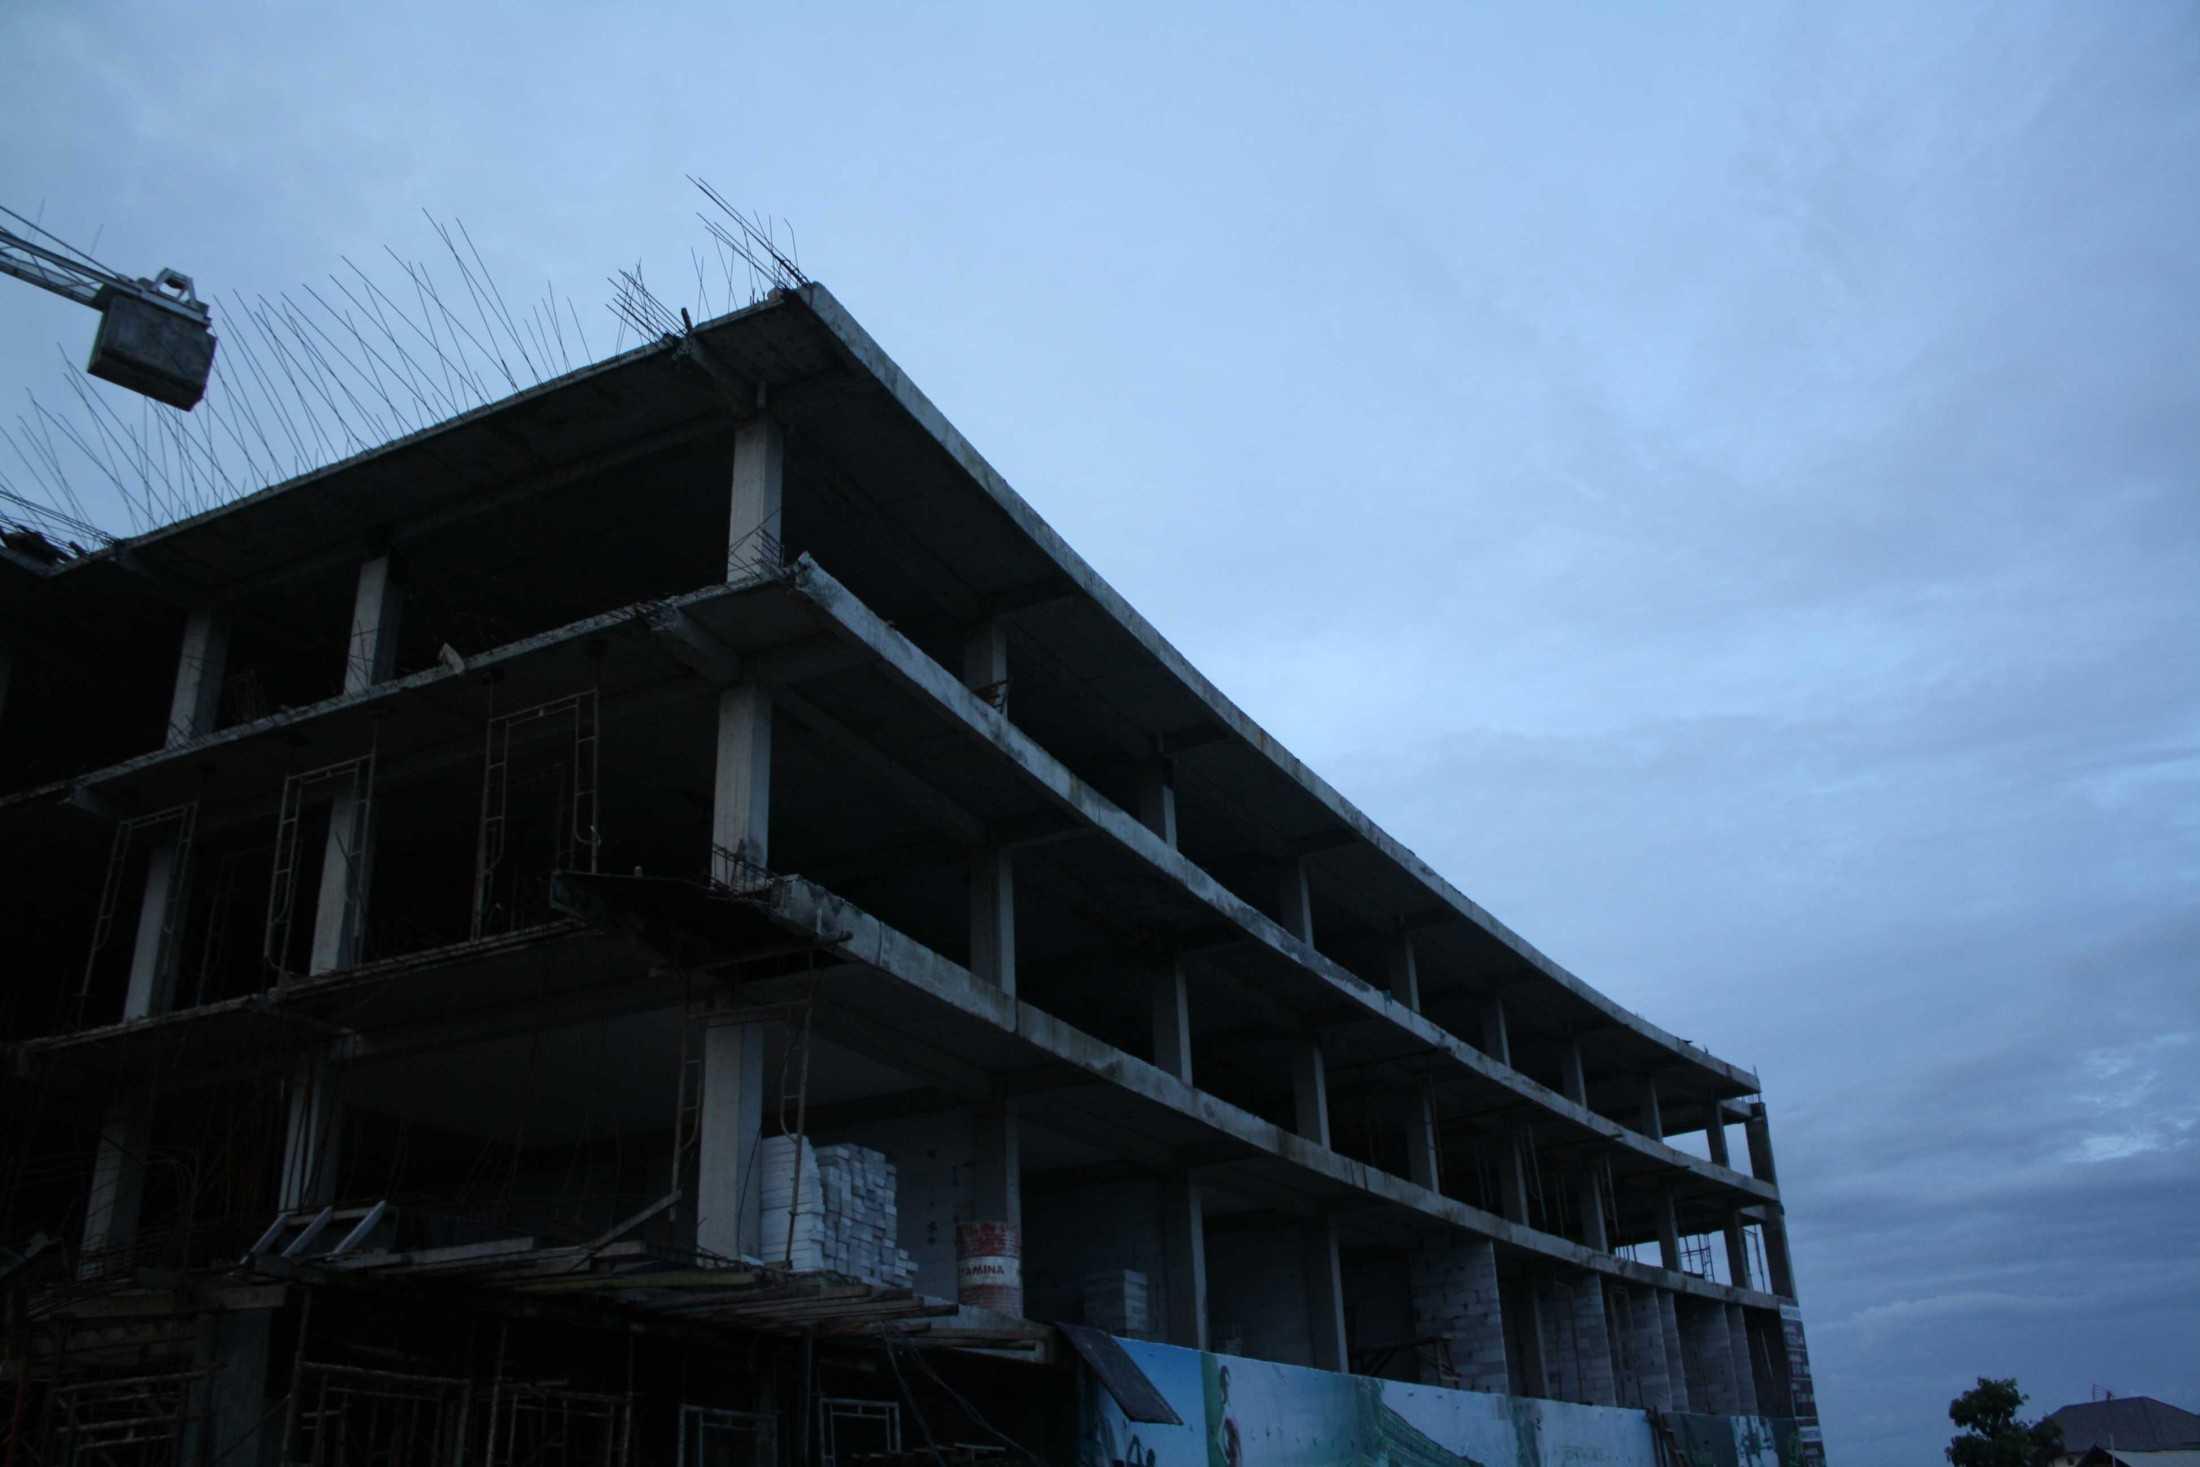 Diro Karya Construction Proyek Hotel The Rich Prada Bali Jl. Pecatu Indah Resort Blok B2, Pecatu, South Kuta, Badung Regency, Bali 80361, Indonesia Jl. Pecatu Indah Resort Blok B2, Pecatu, South Kuta, Badung Regency, Bali 80361, Indonesia Diro-Karya-Construction-Proyek-Hotel-The-Rich-Prada-Bali  72577